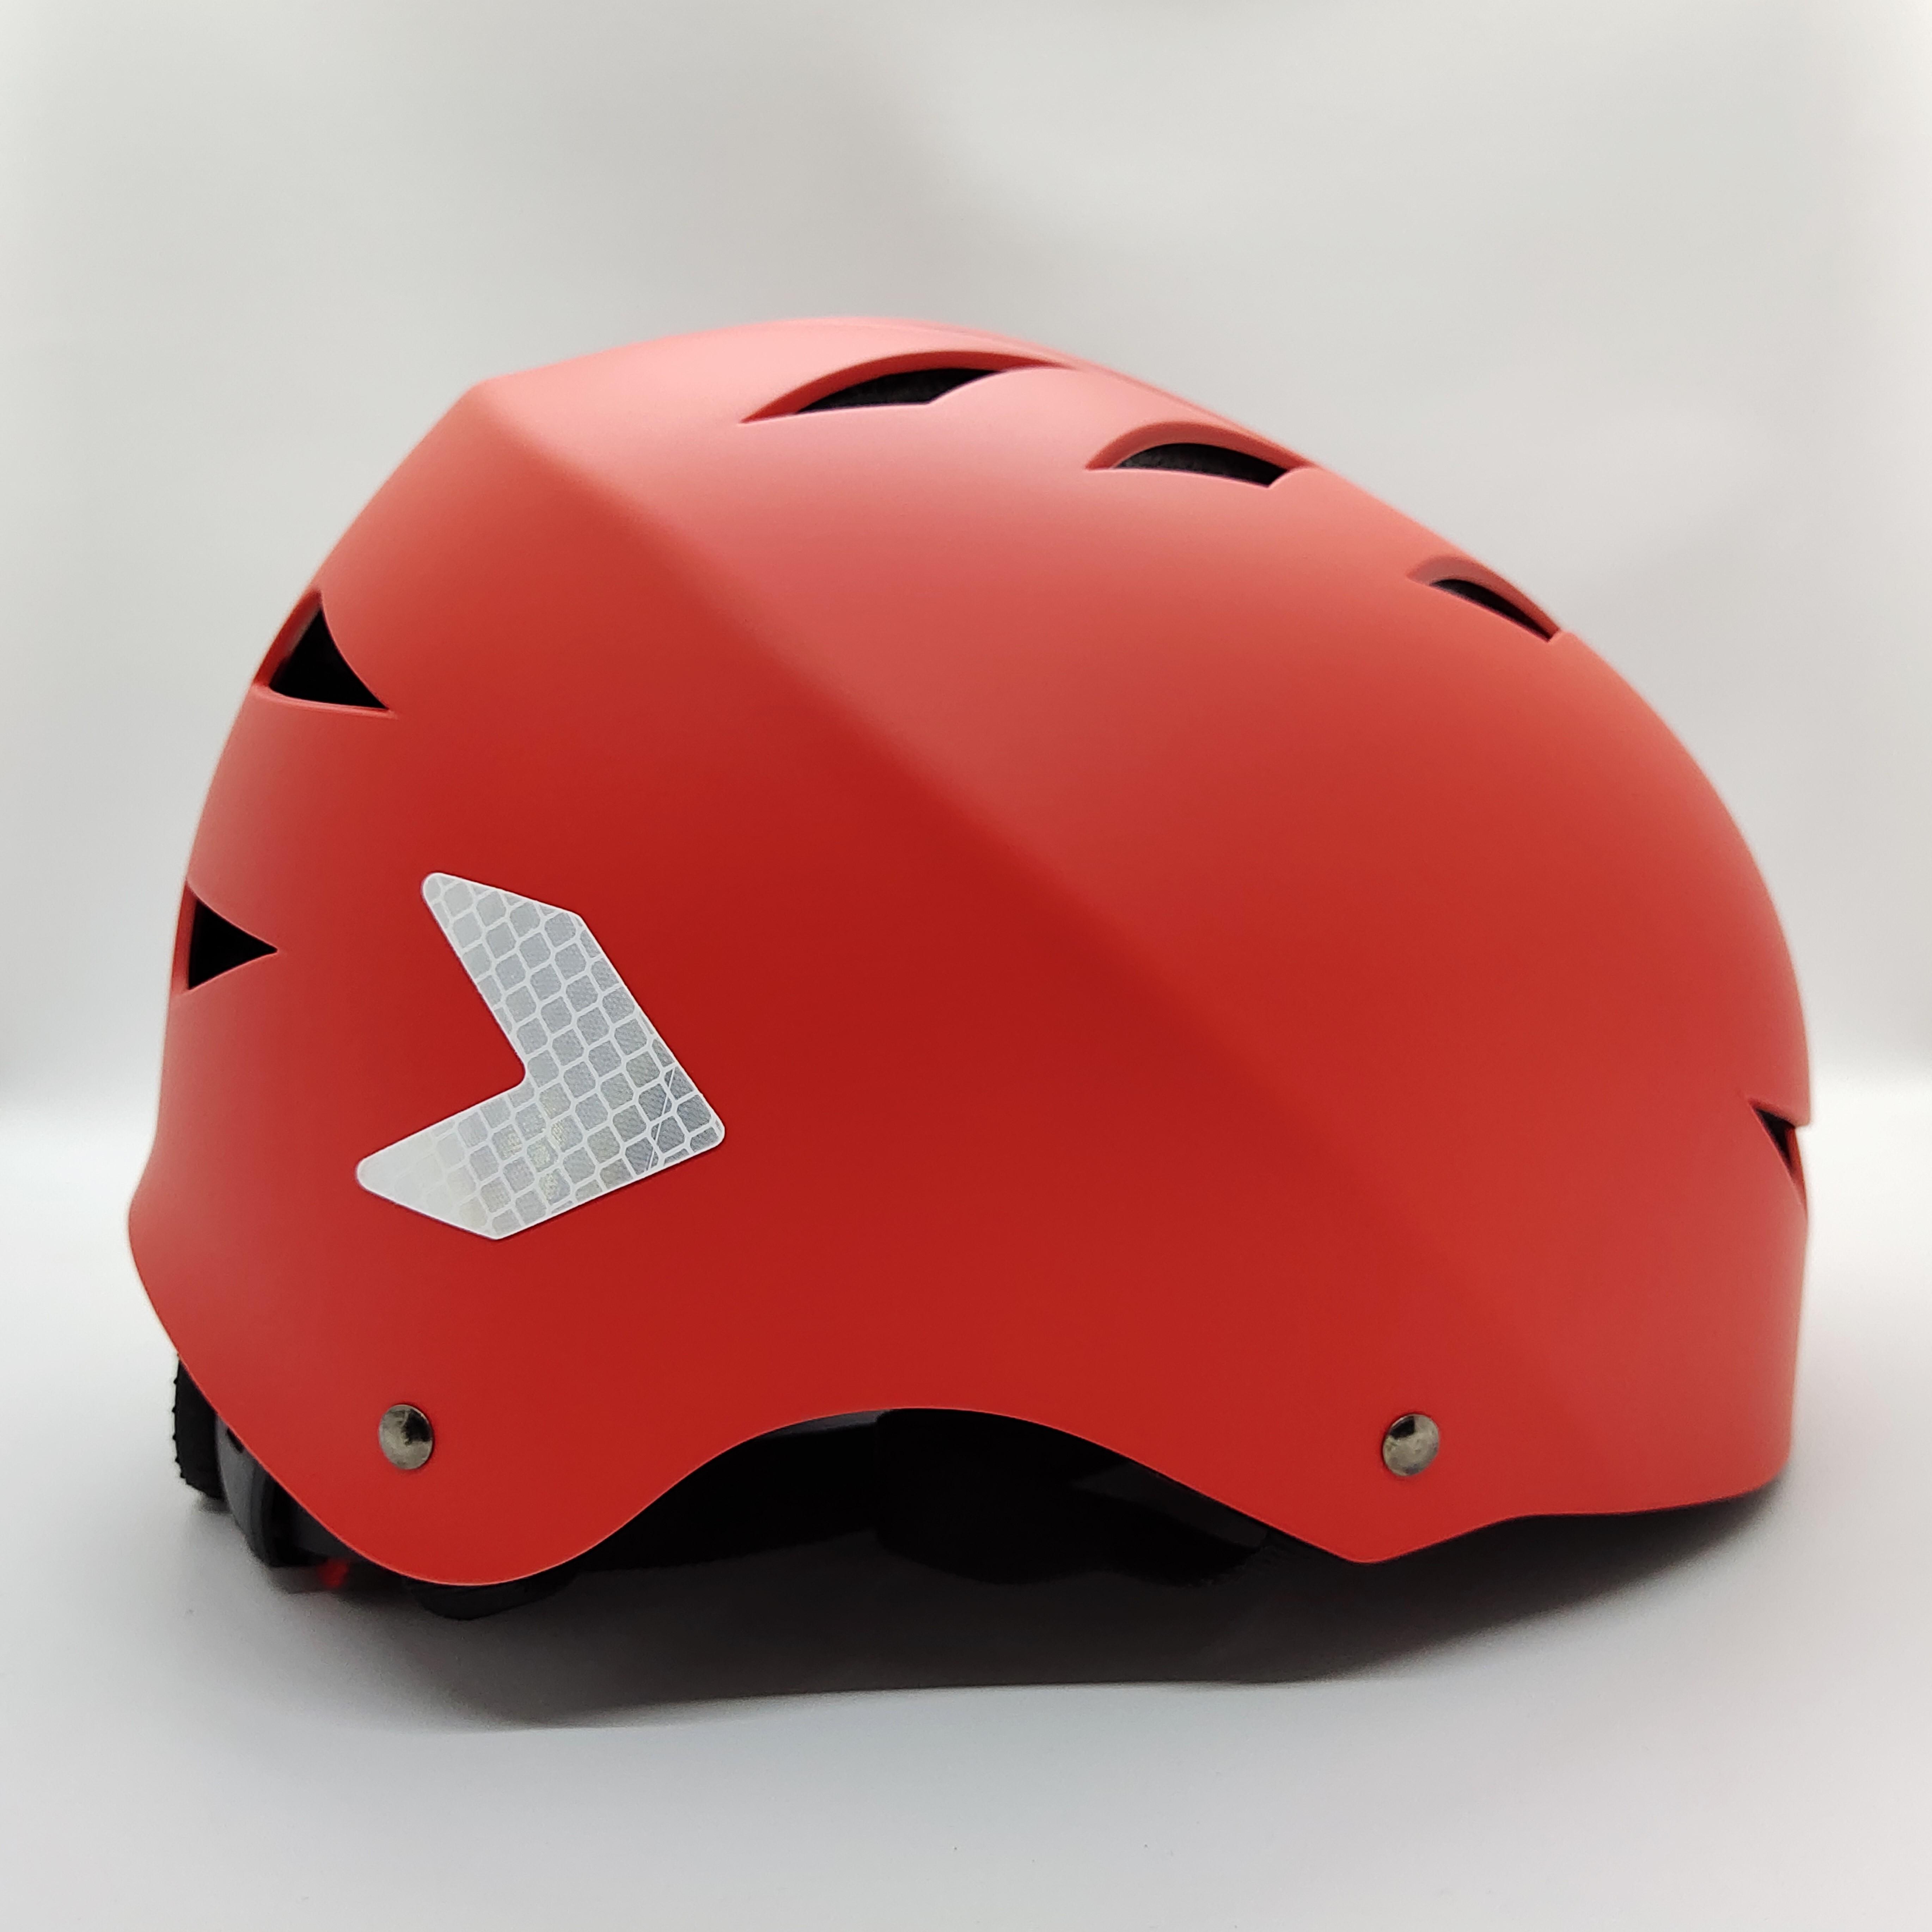 IMG 20200511 114721 - Skutis Gear Helmet